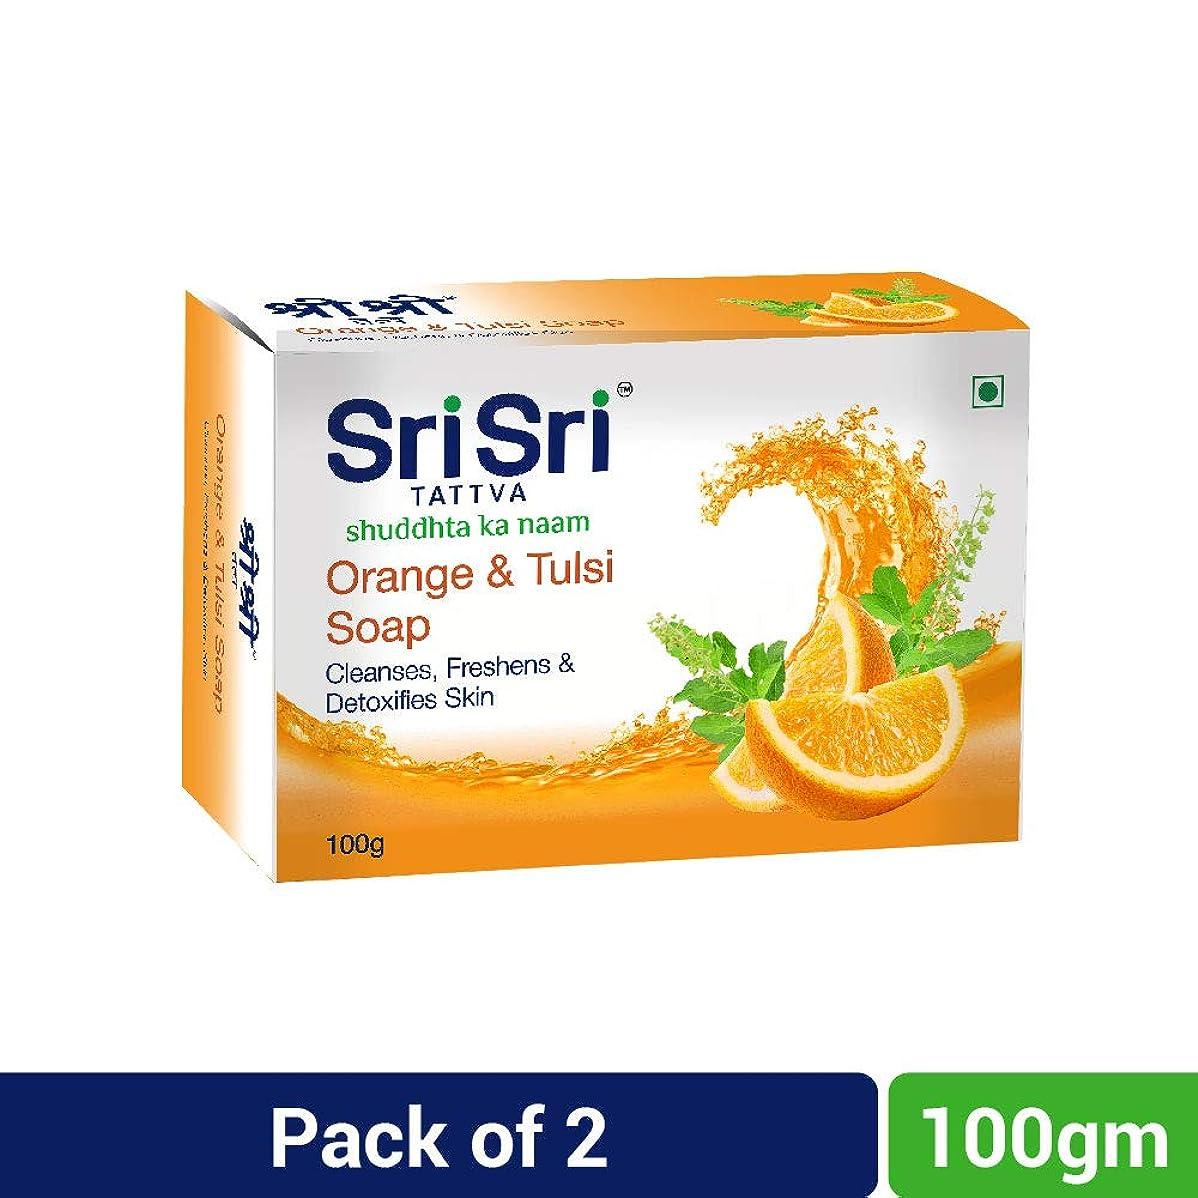 三角形安価な救援Sri Sri Tattva Orange & Tulsi Soap, 200gm (100gm x 2)